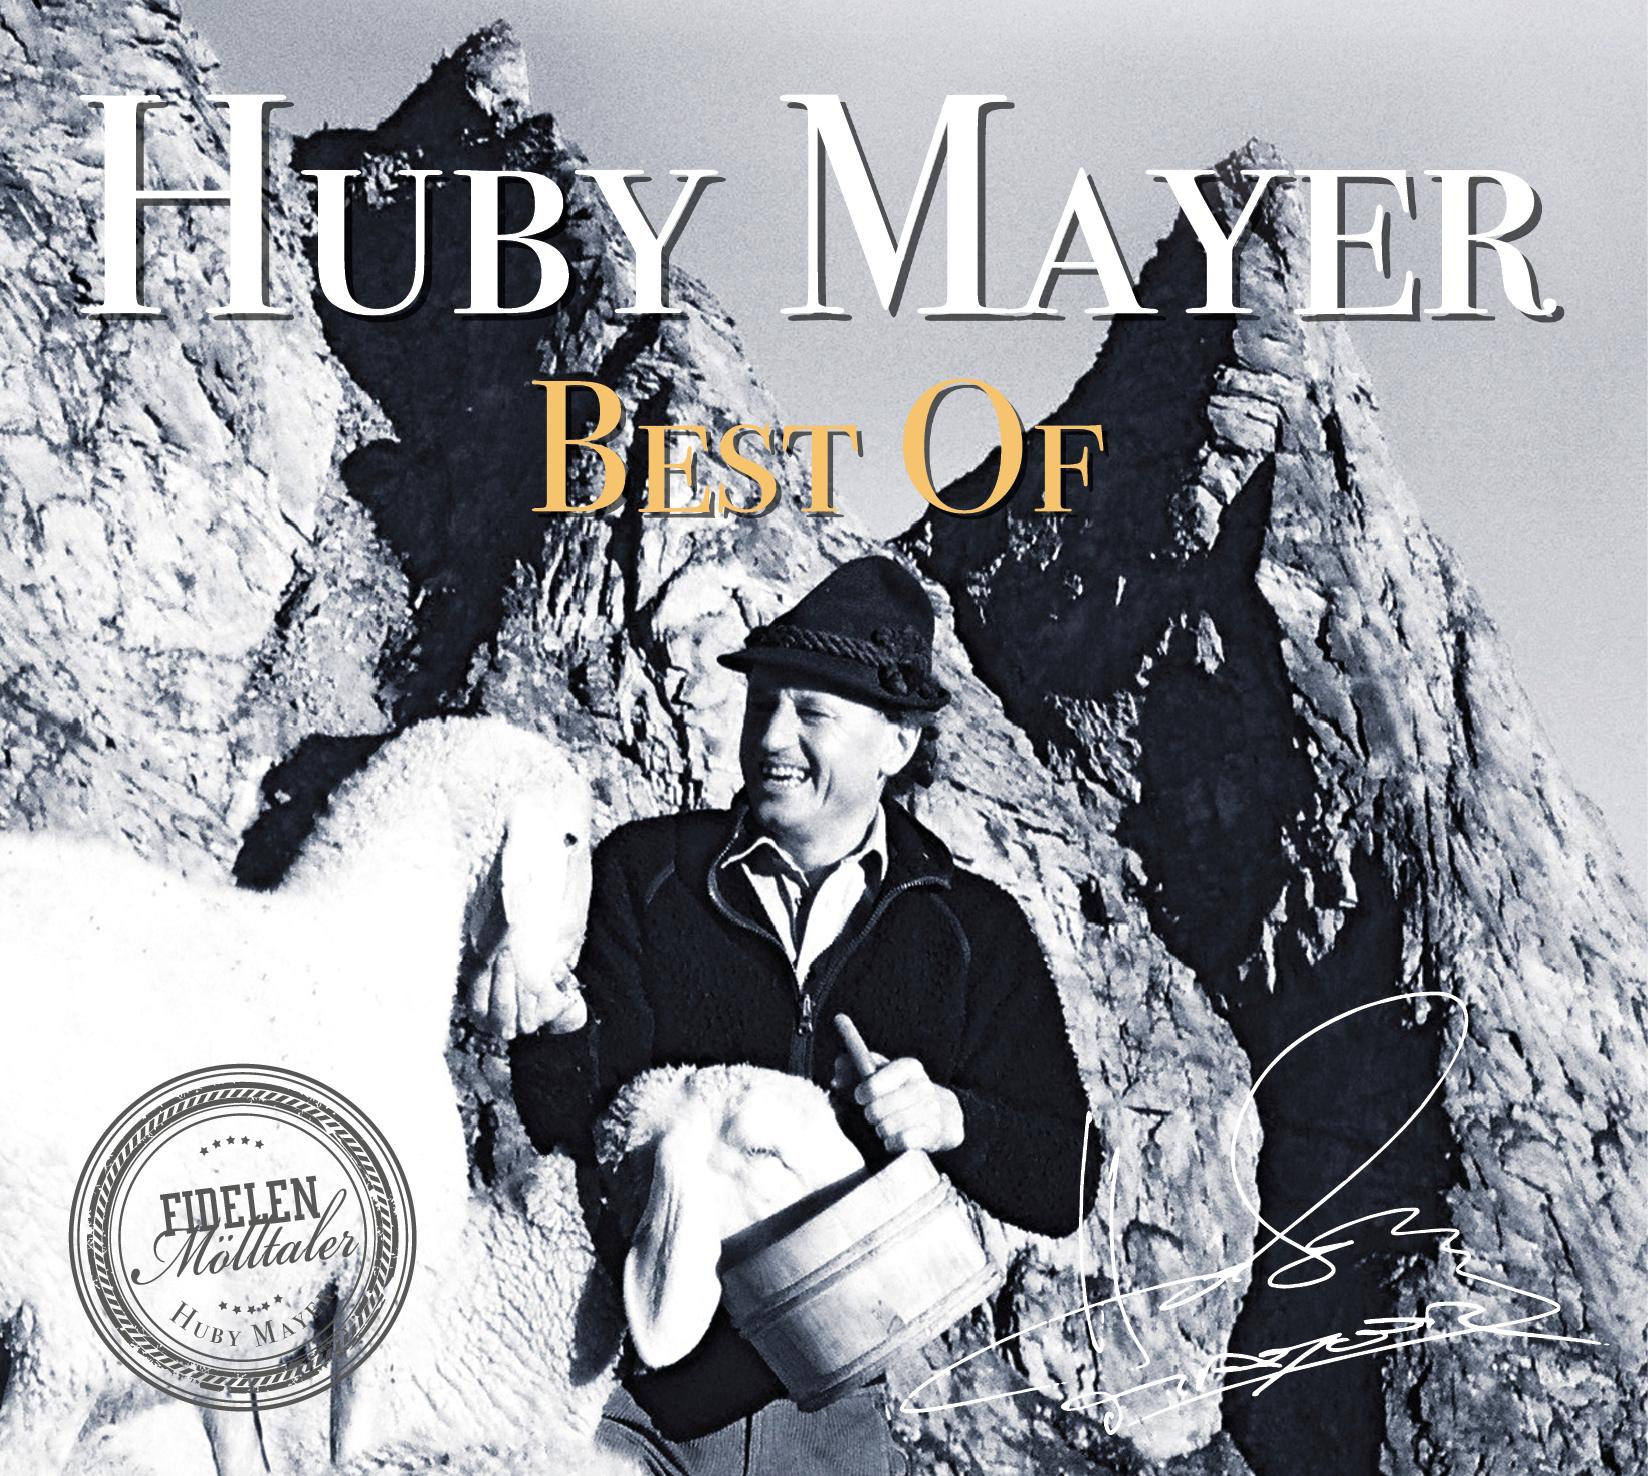 HubyMayer_CDCover_Moelltaler